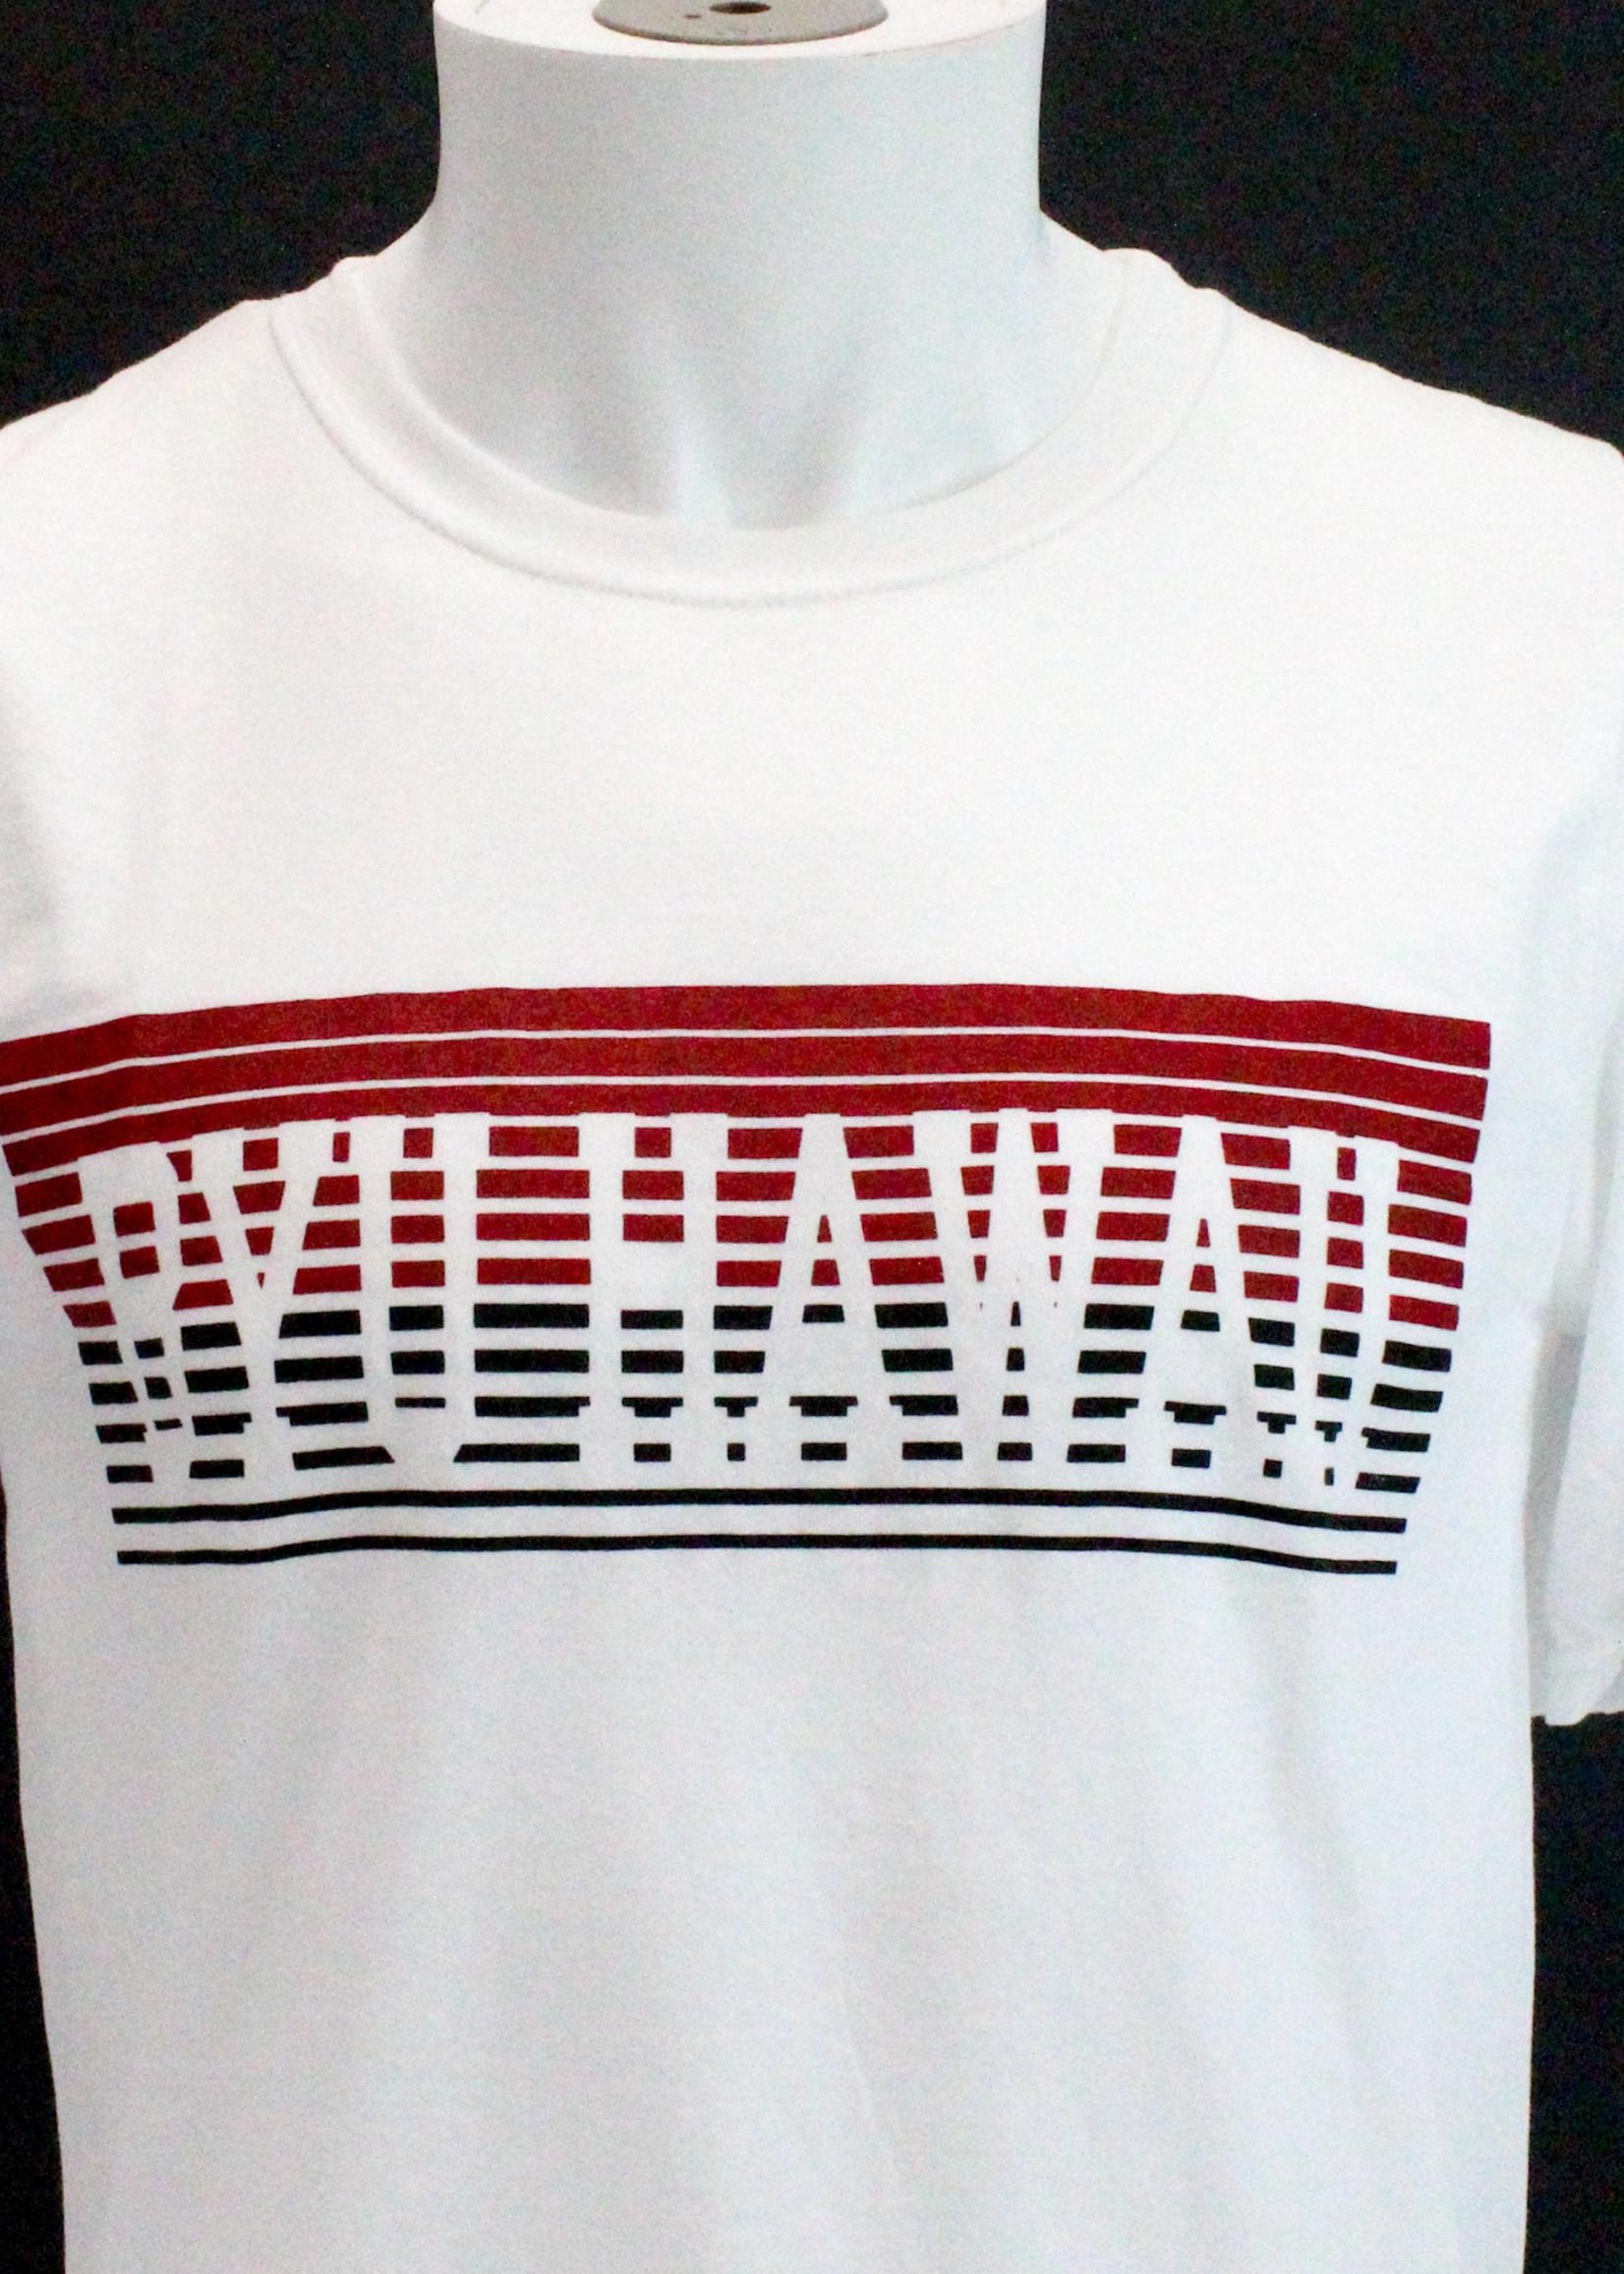 BYU-Hawaii Short Sleeved Blend Tee w/ Retro Stripes